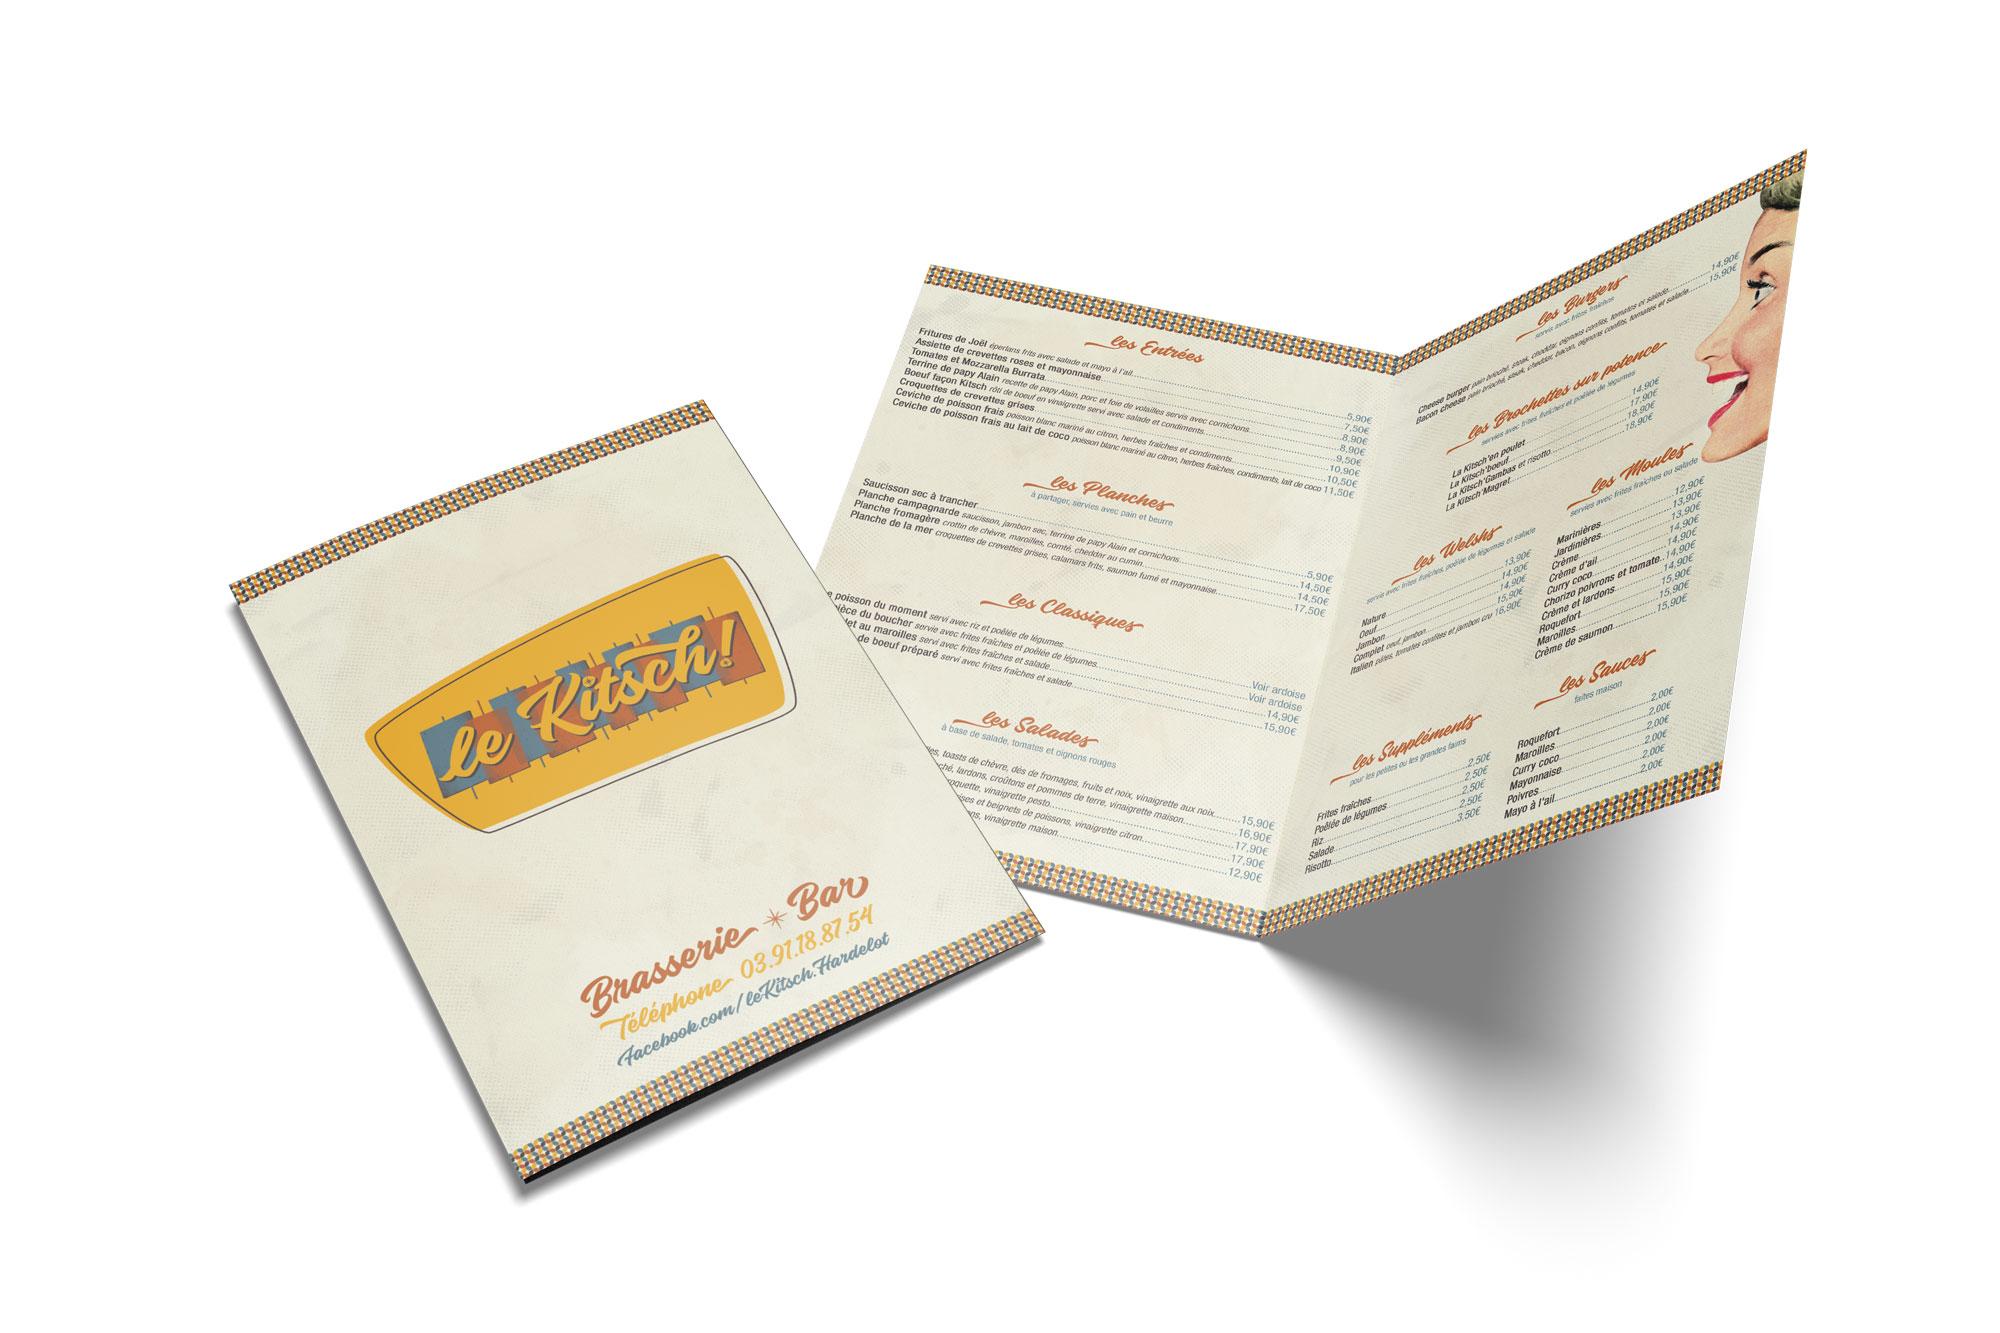 Menu de restaurant - Brasserie - Le Kitsch ! - Hardelot